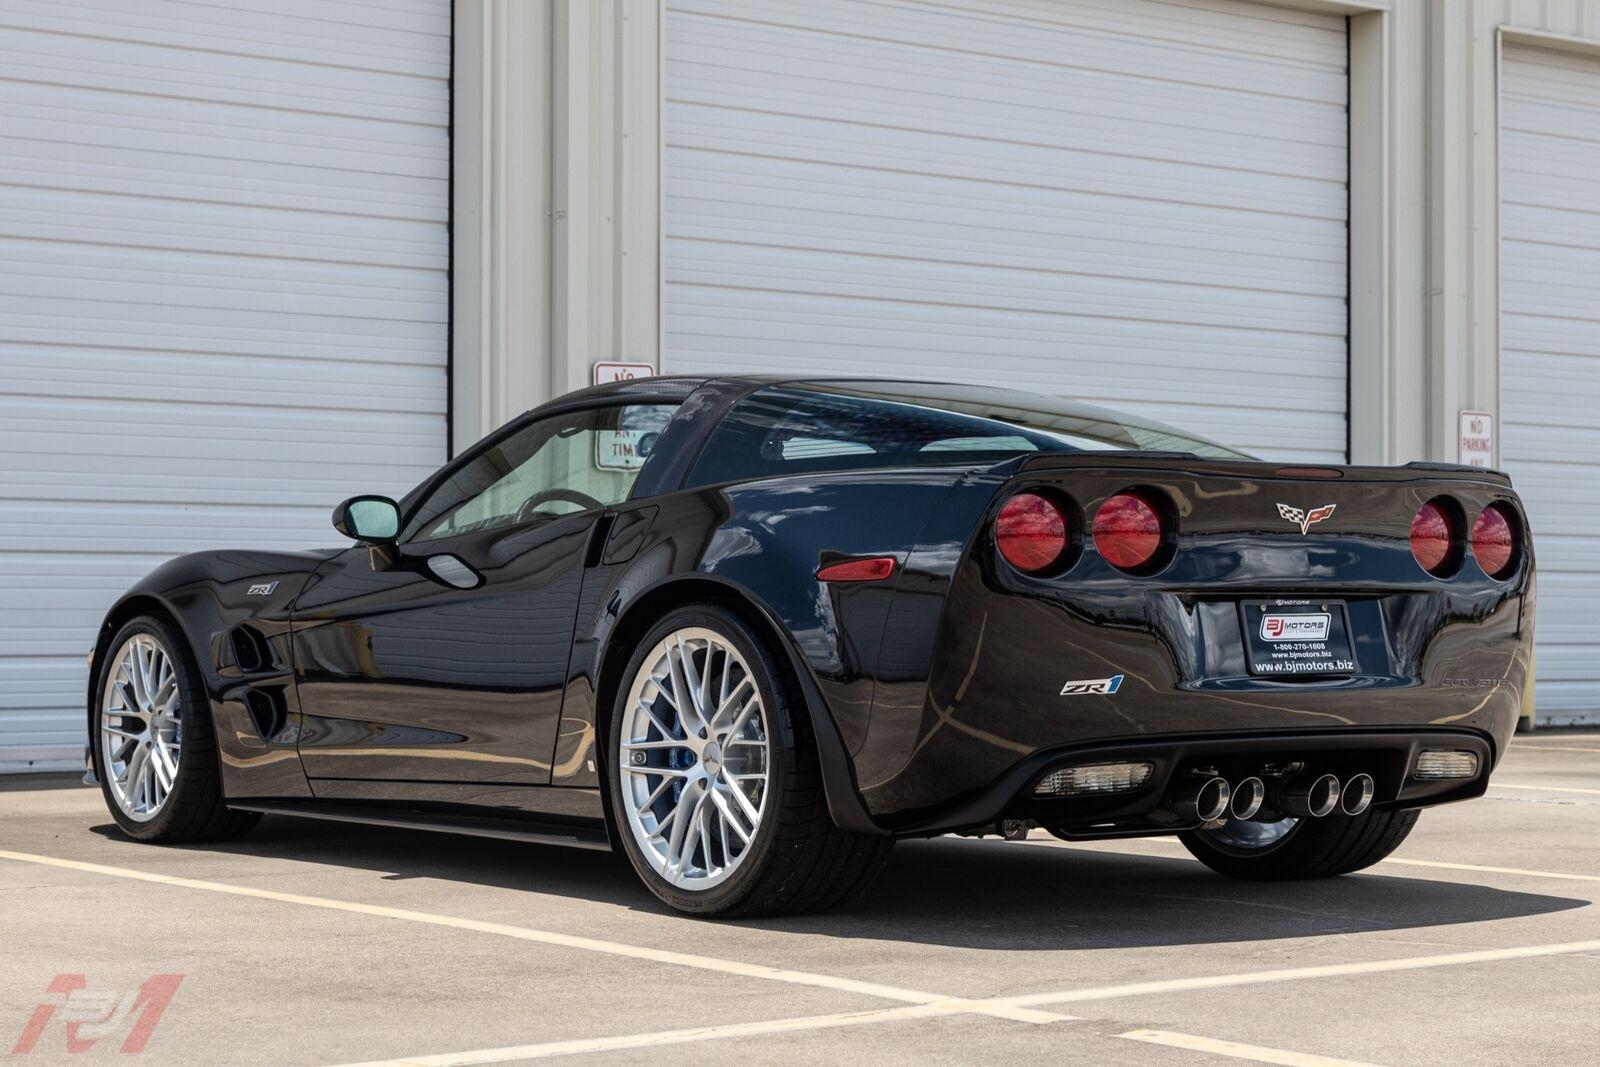 2009 Black Chevrolet Corvette ZR1    C6 Corvette Photo 10